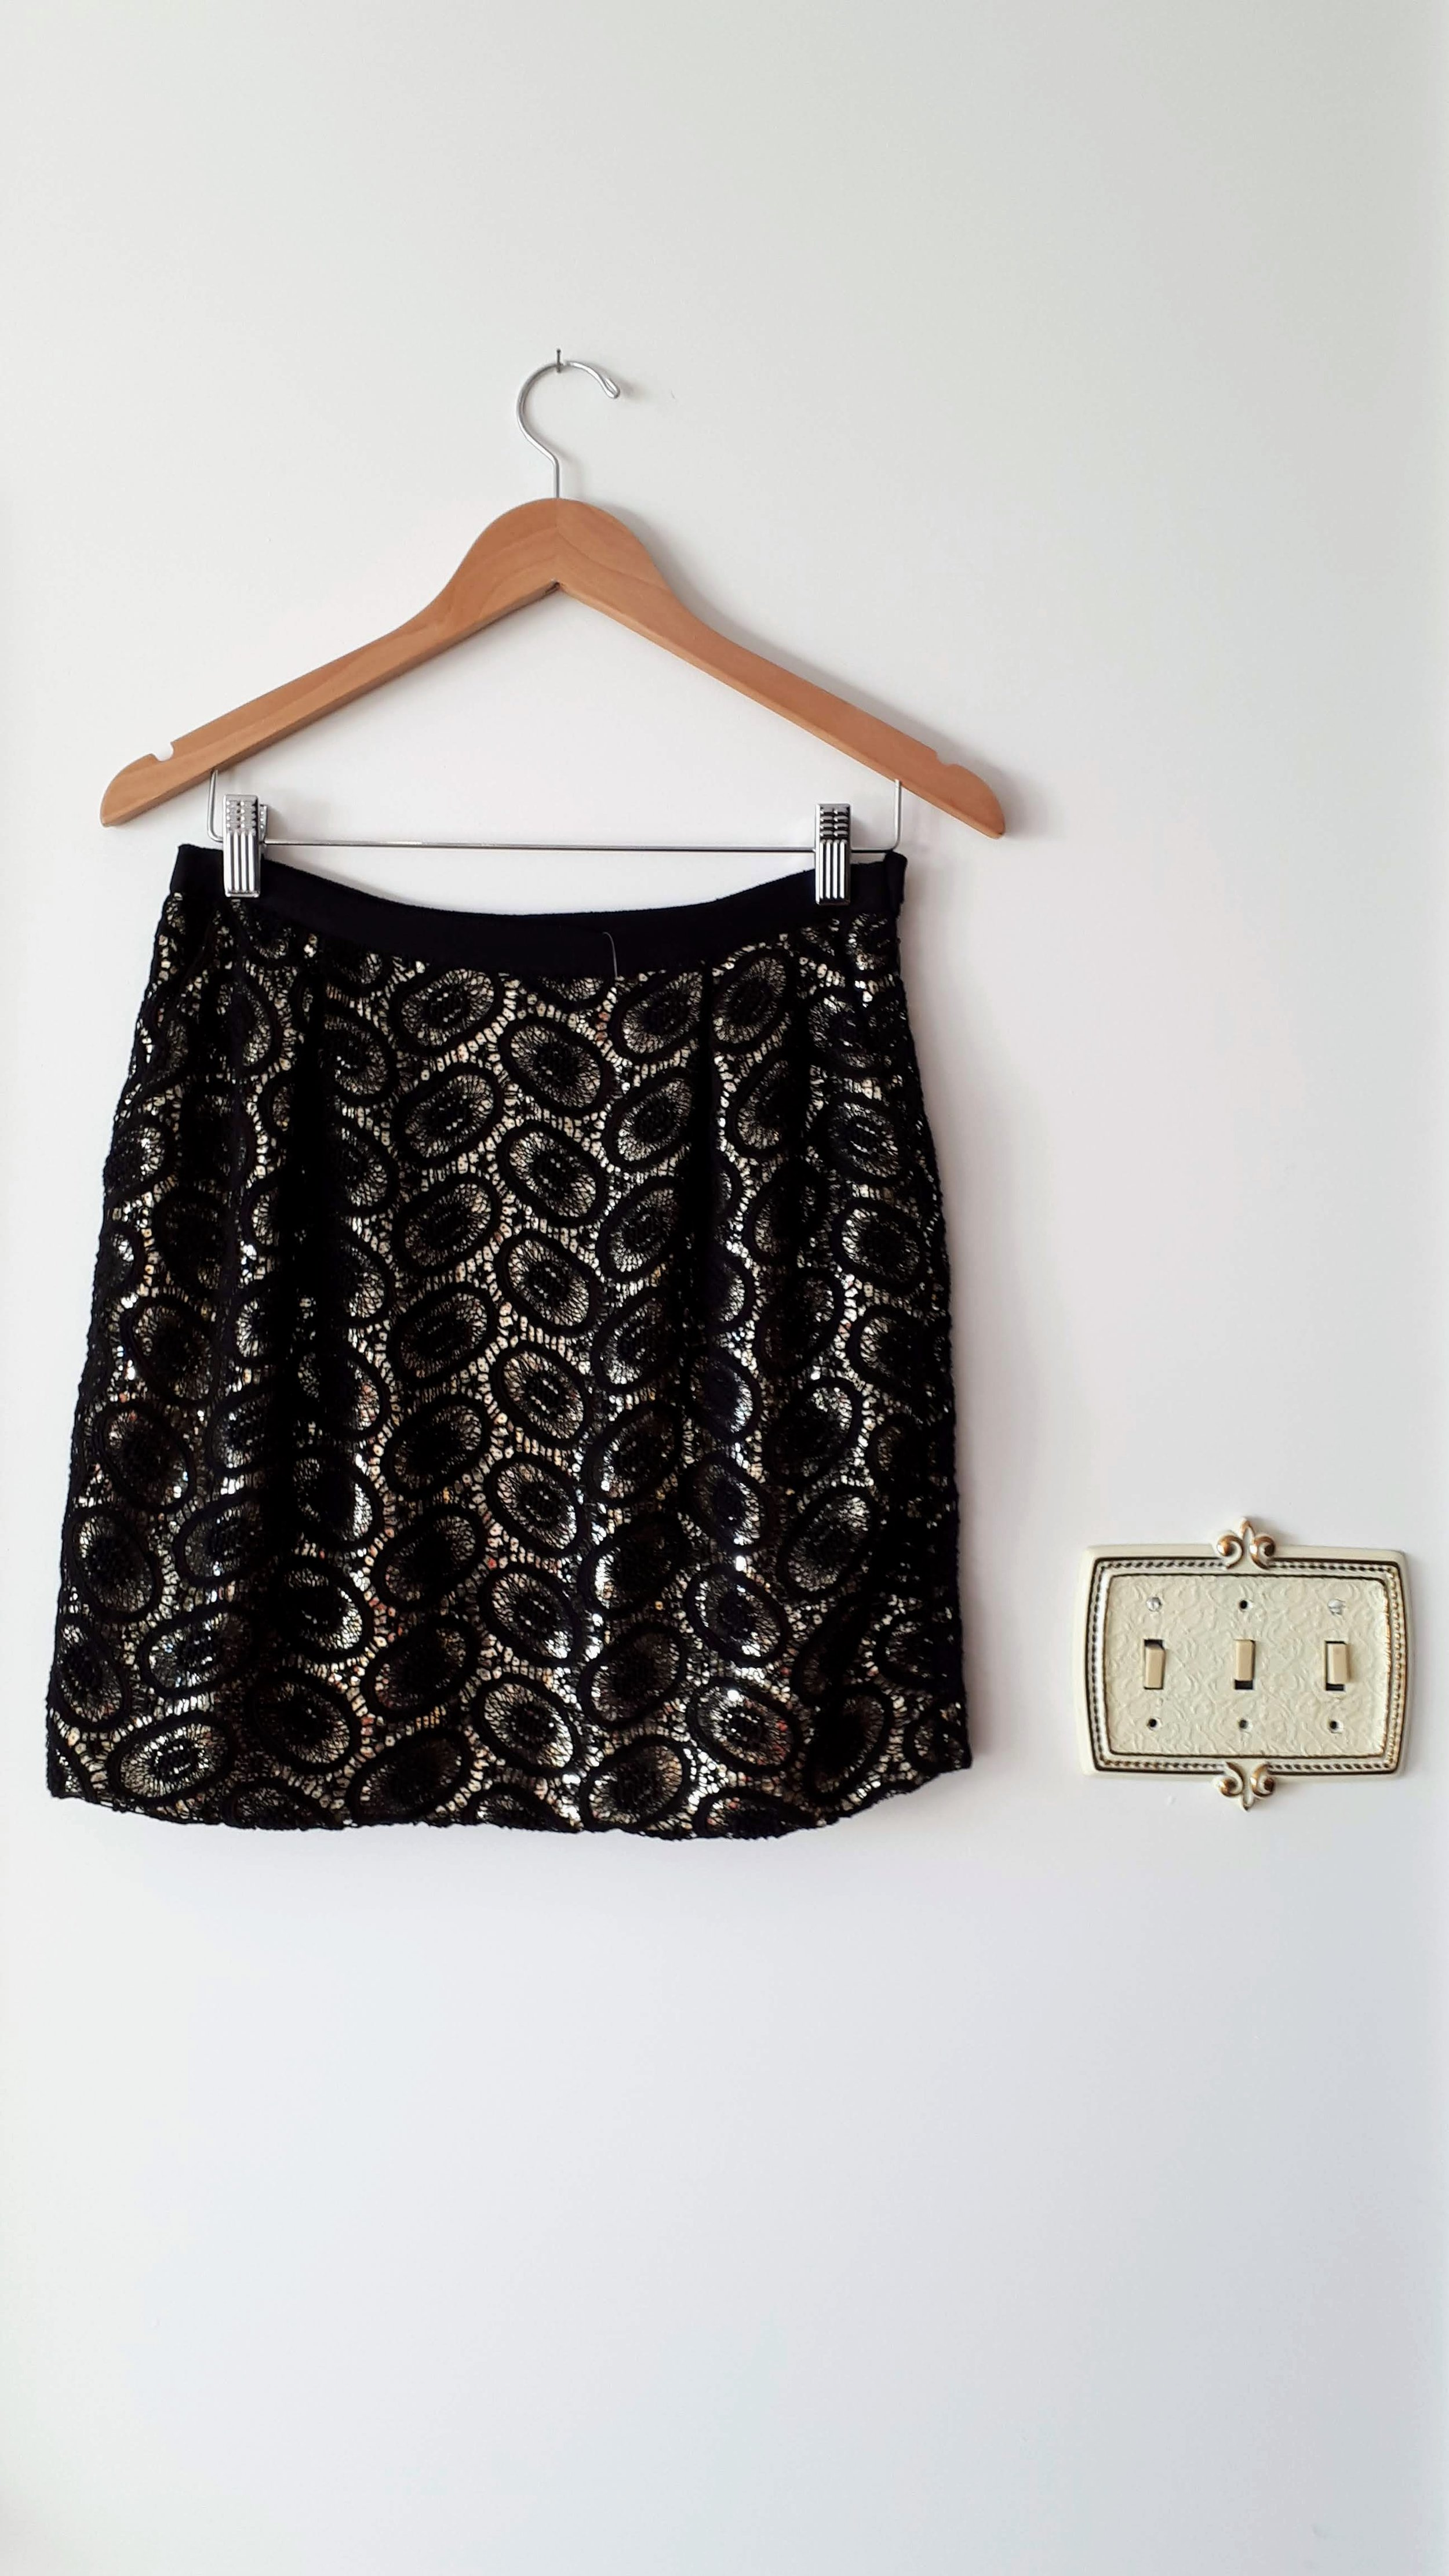 Phillip Lim skirt; Size 6, $125